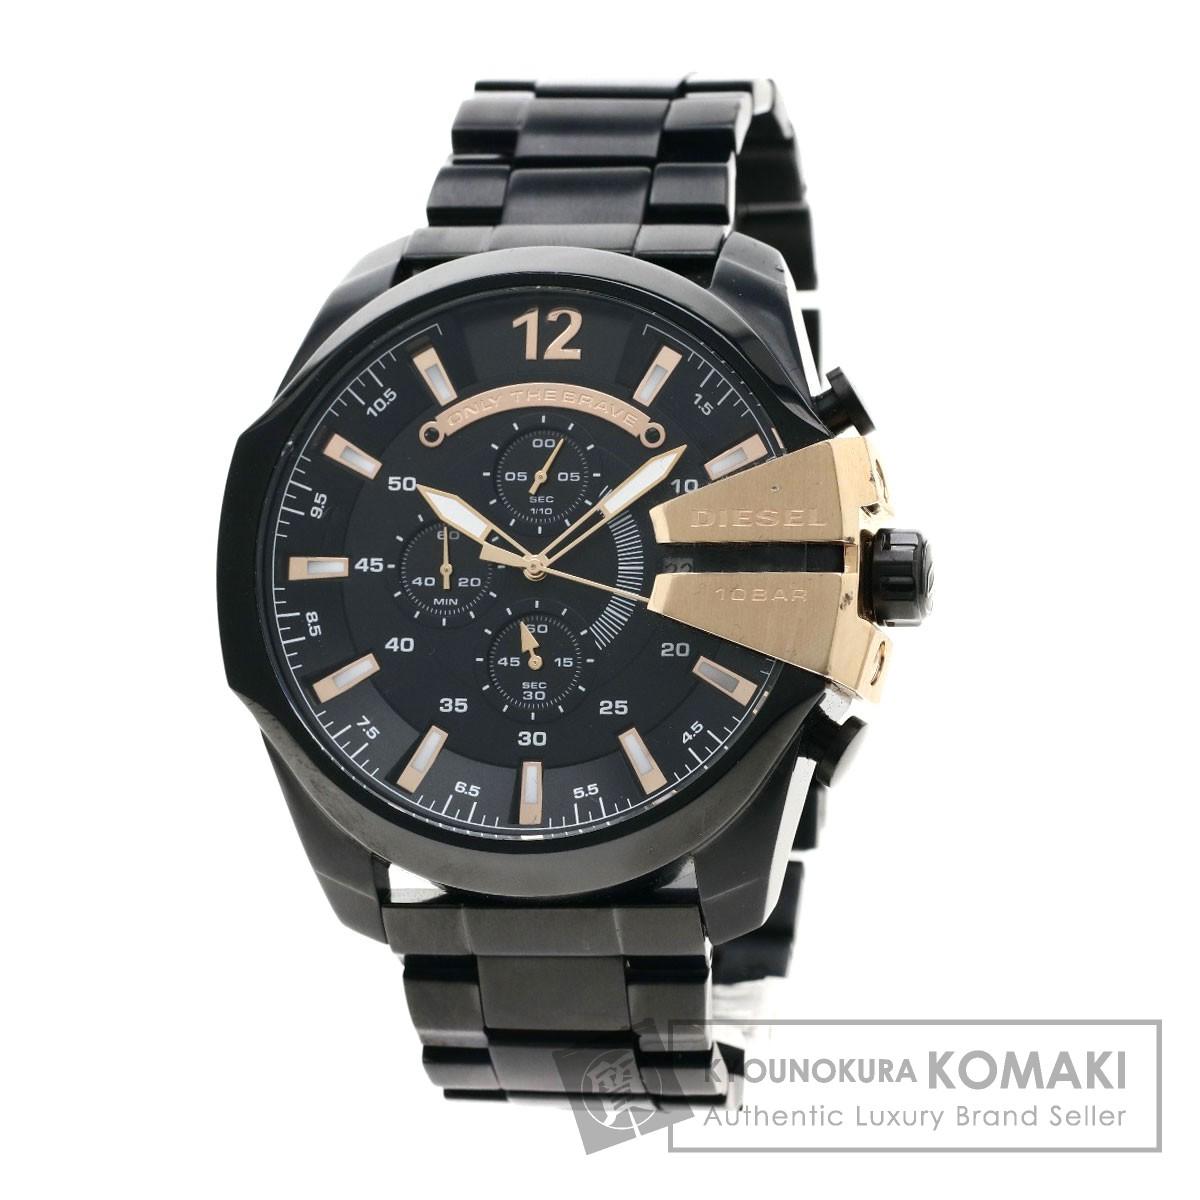 DIESEL DZ-4309 腕時計 ステンレススチール メンズ 【中古】【ディーゼル】